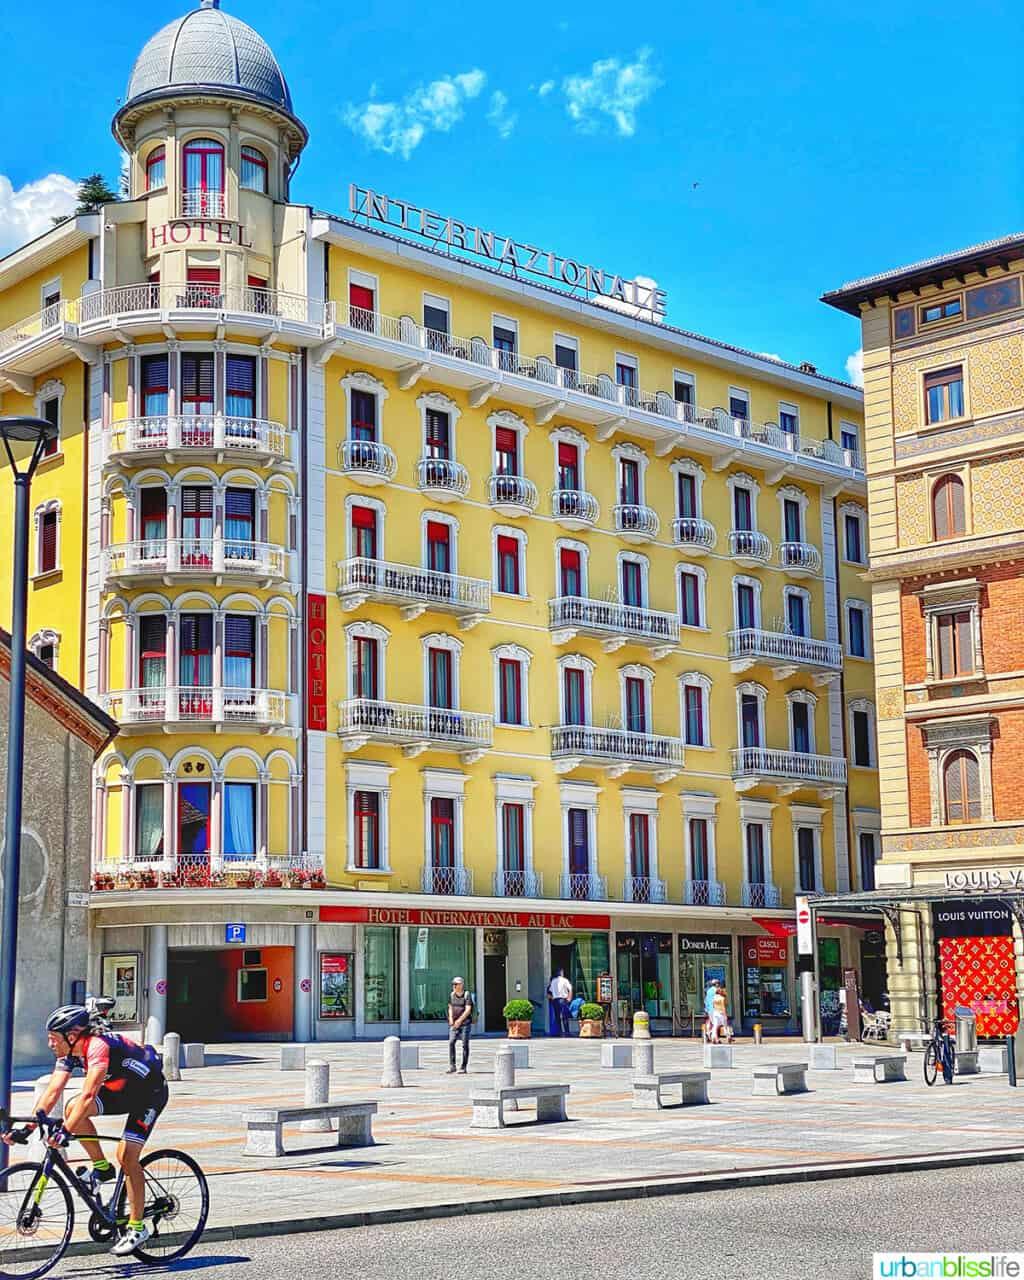 hotel in Lugano, Switzerland